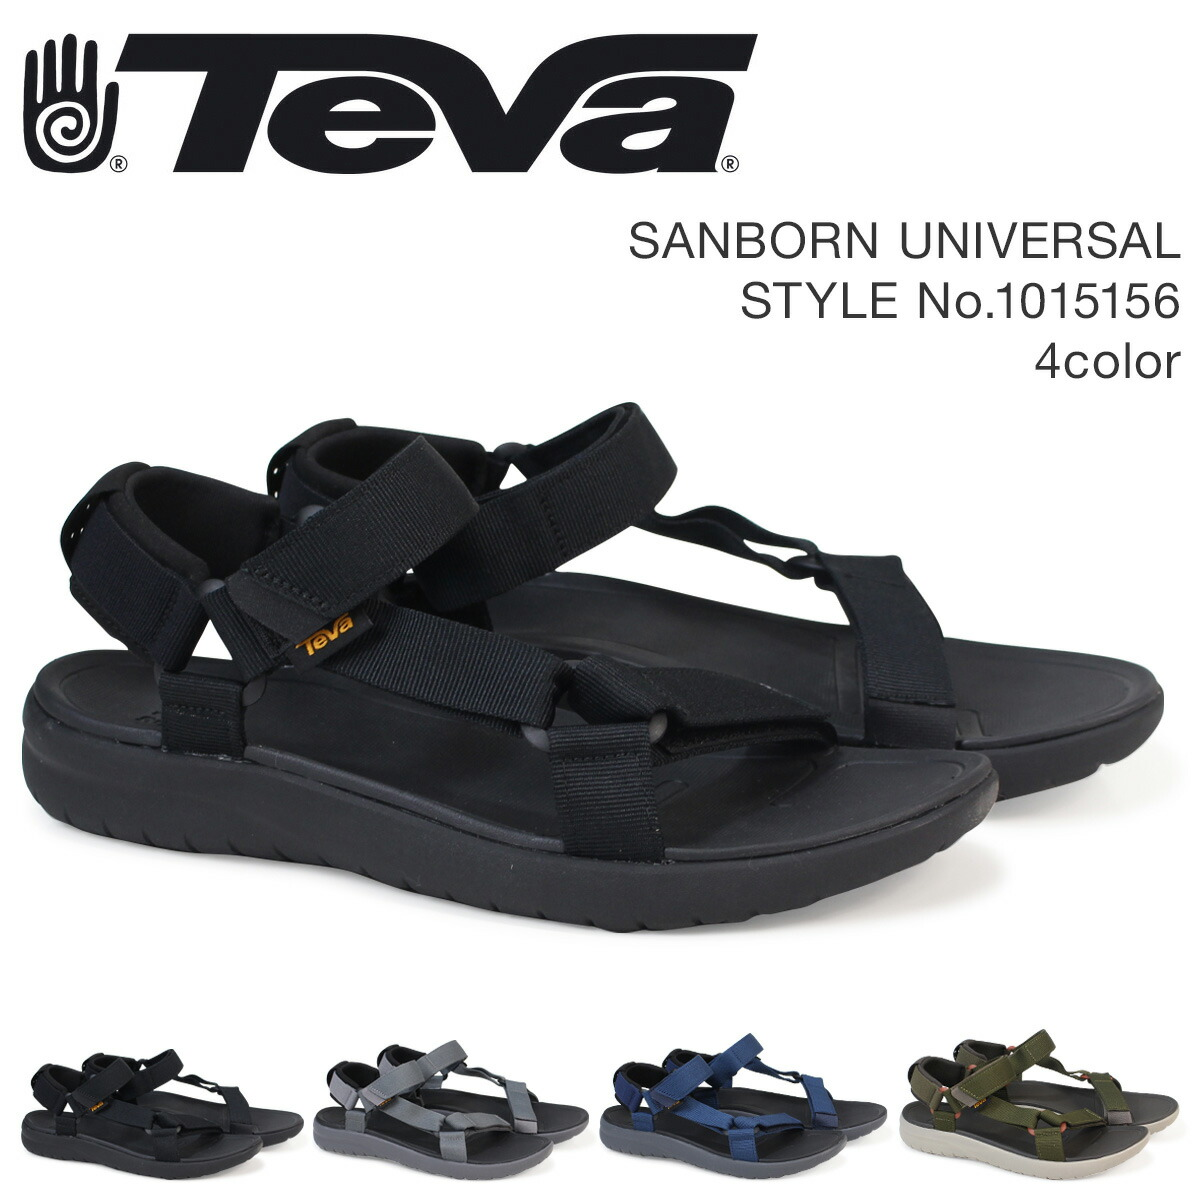 sugar online shop rakuten global market teva teva sandals men sanborn universal sanborn. Black Bedroom Furniture Sets. Home Design Ideas